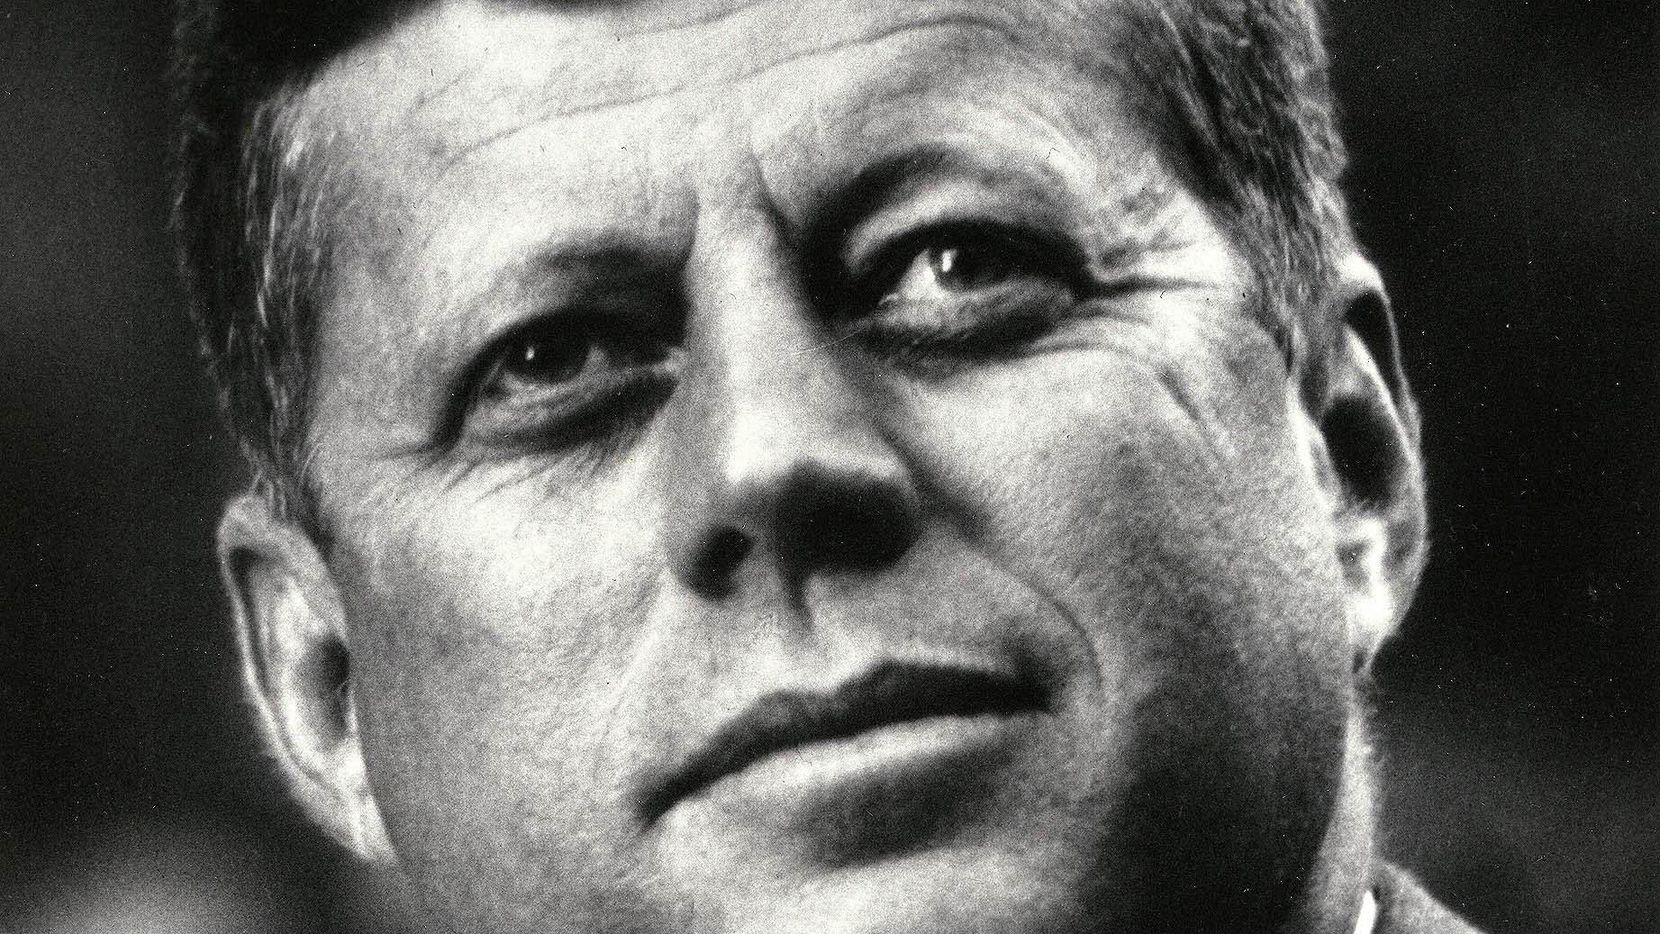 A 1963 photo of Pres. John F. Kennedy.